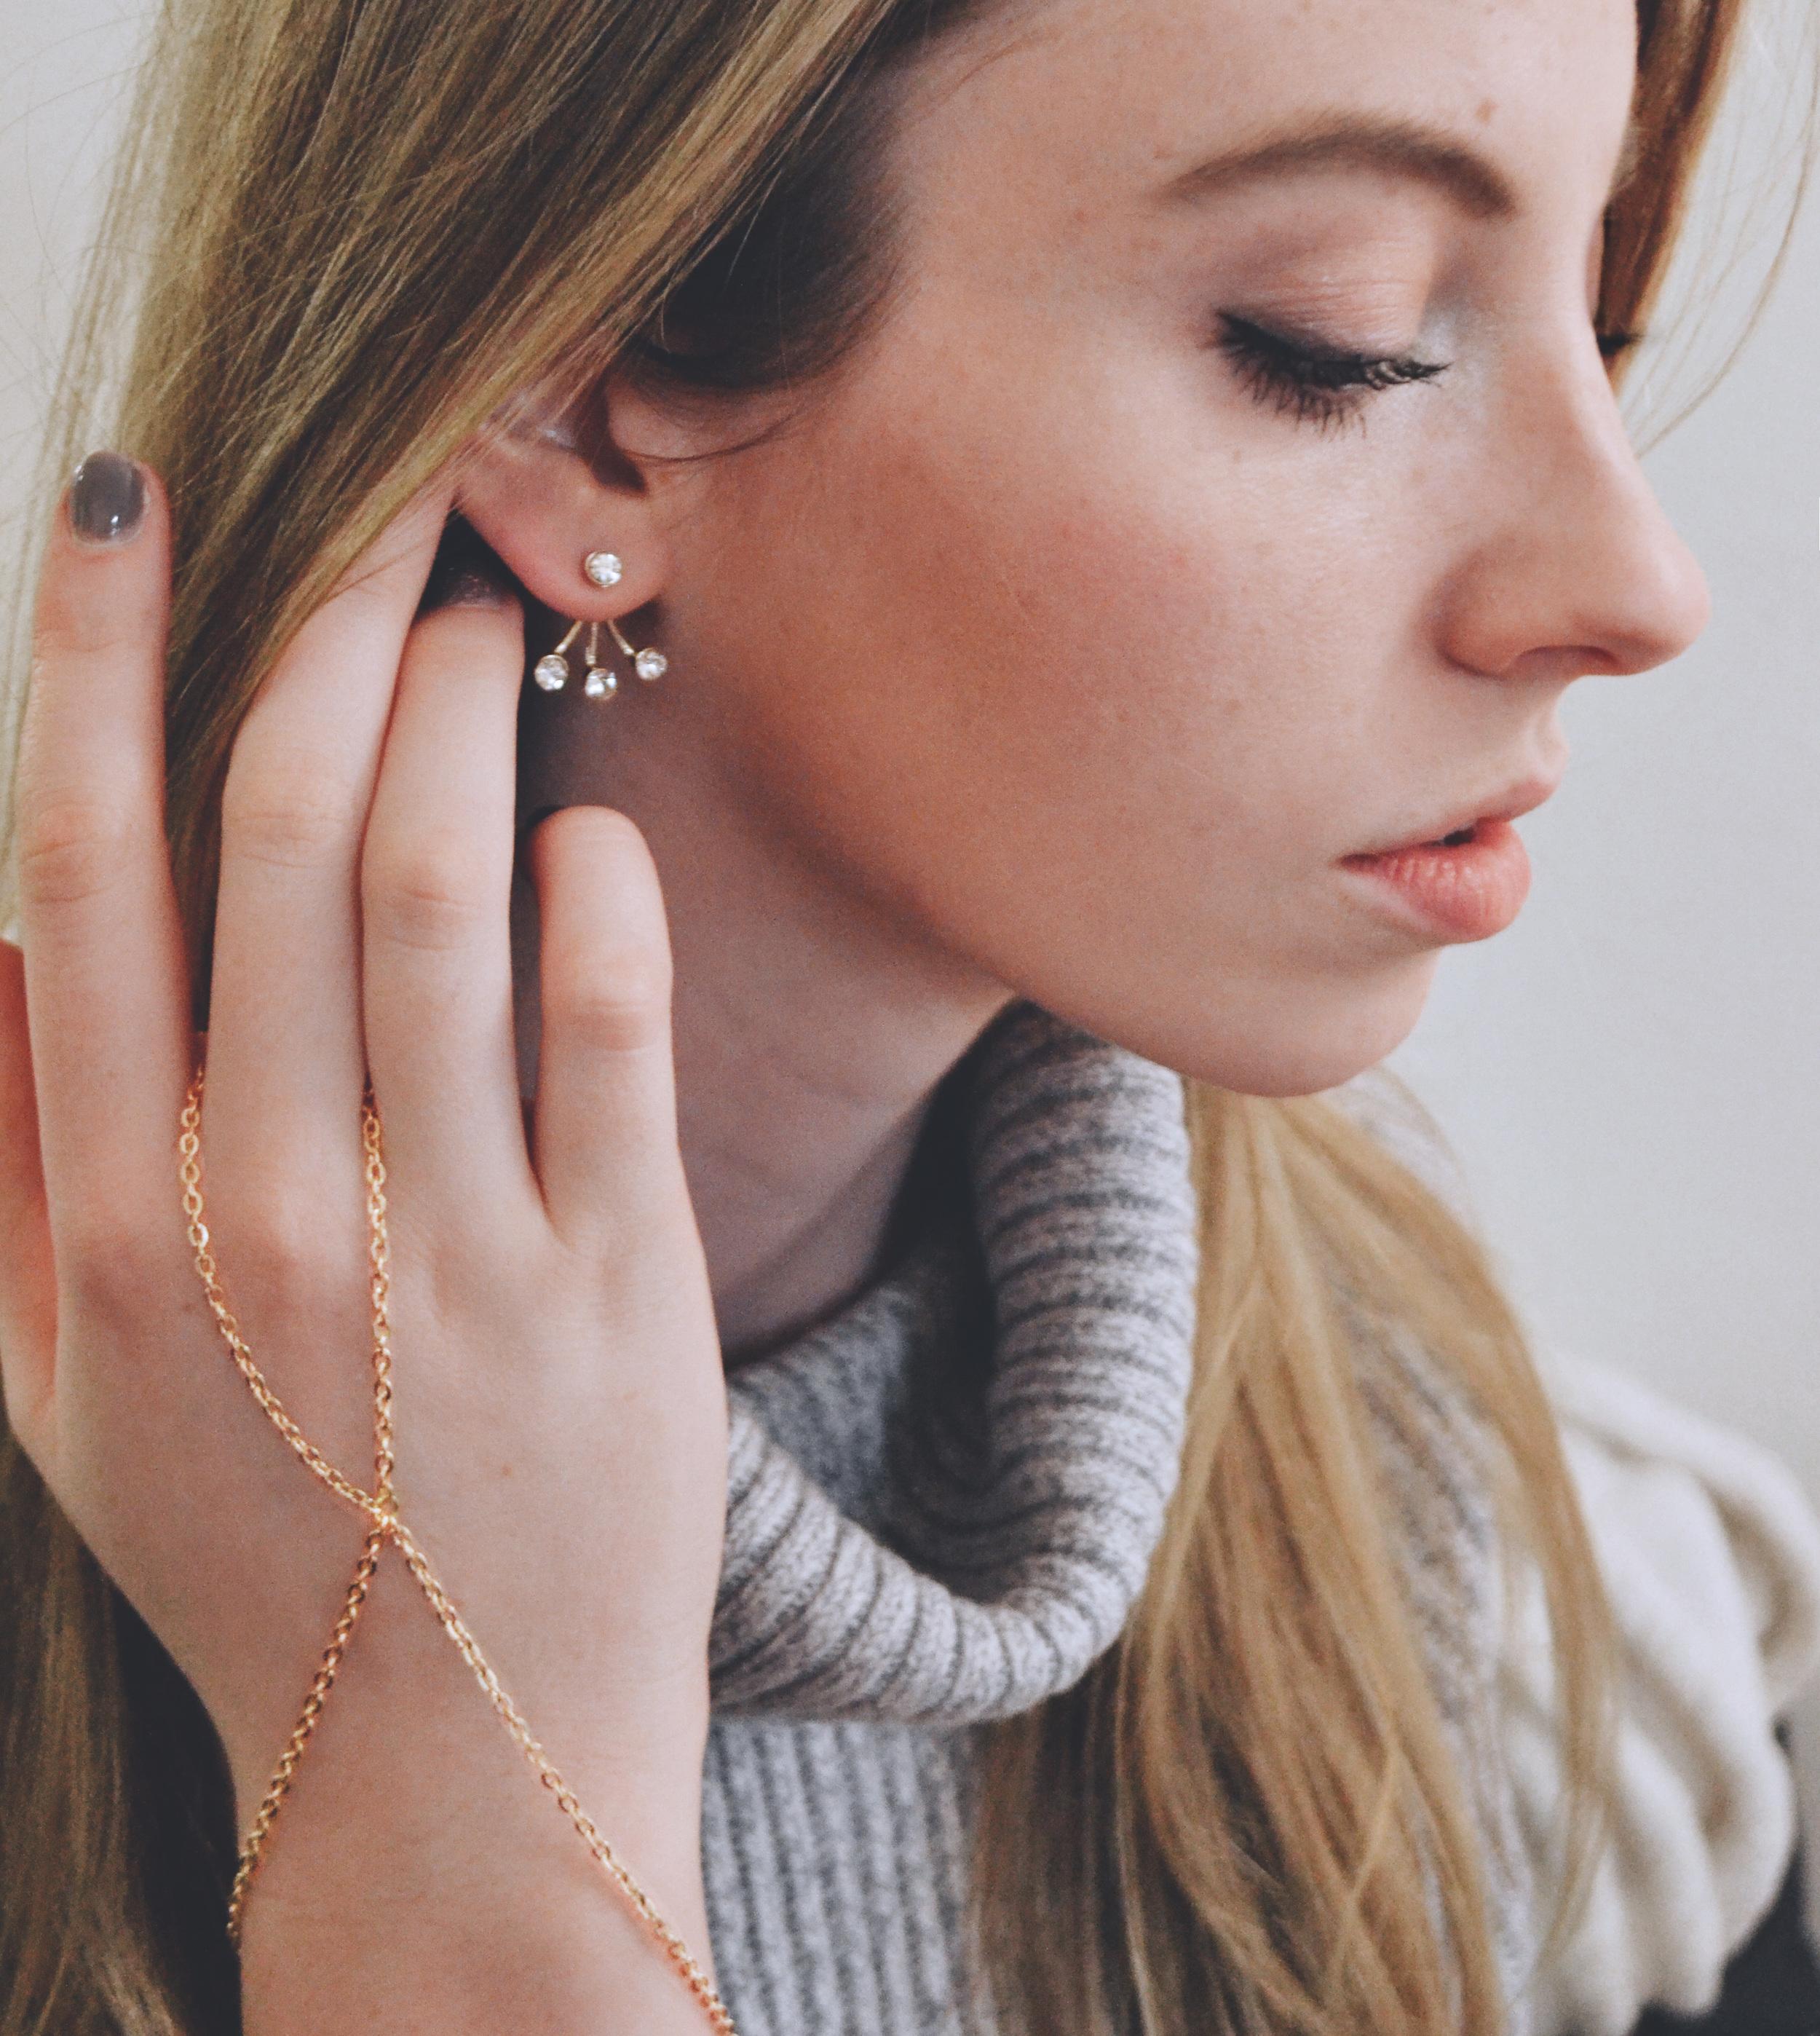 Ear Jacket & Hand Chain Bracelet | Girl x Garment